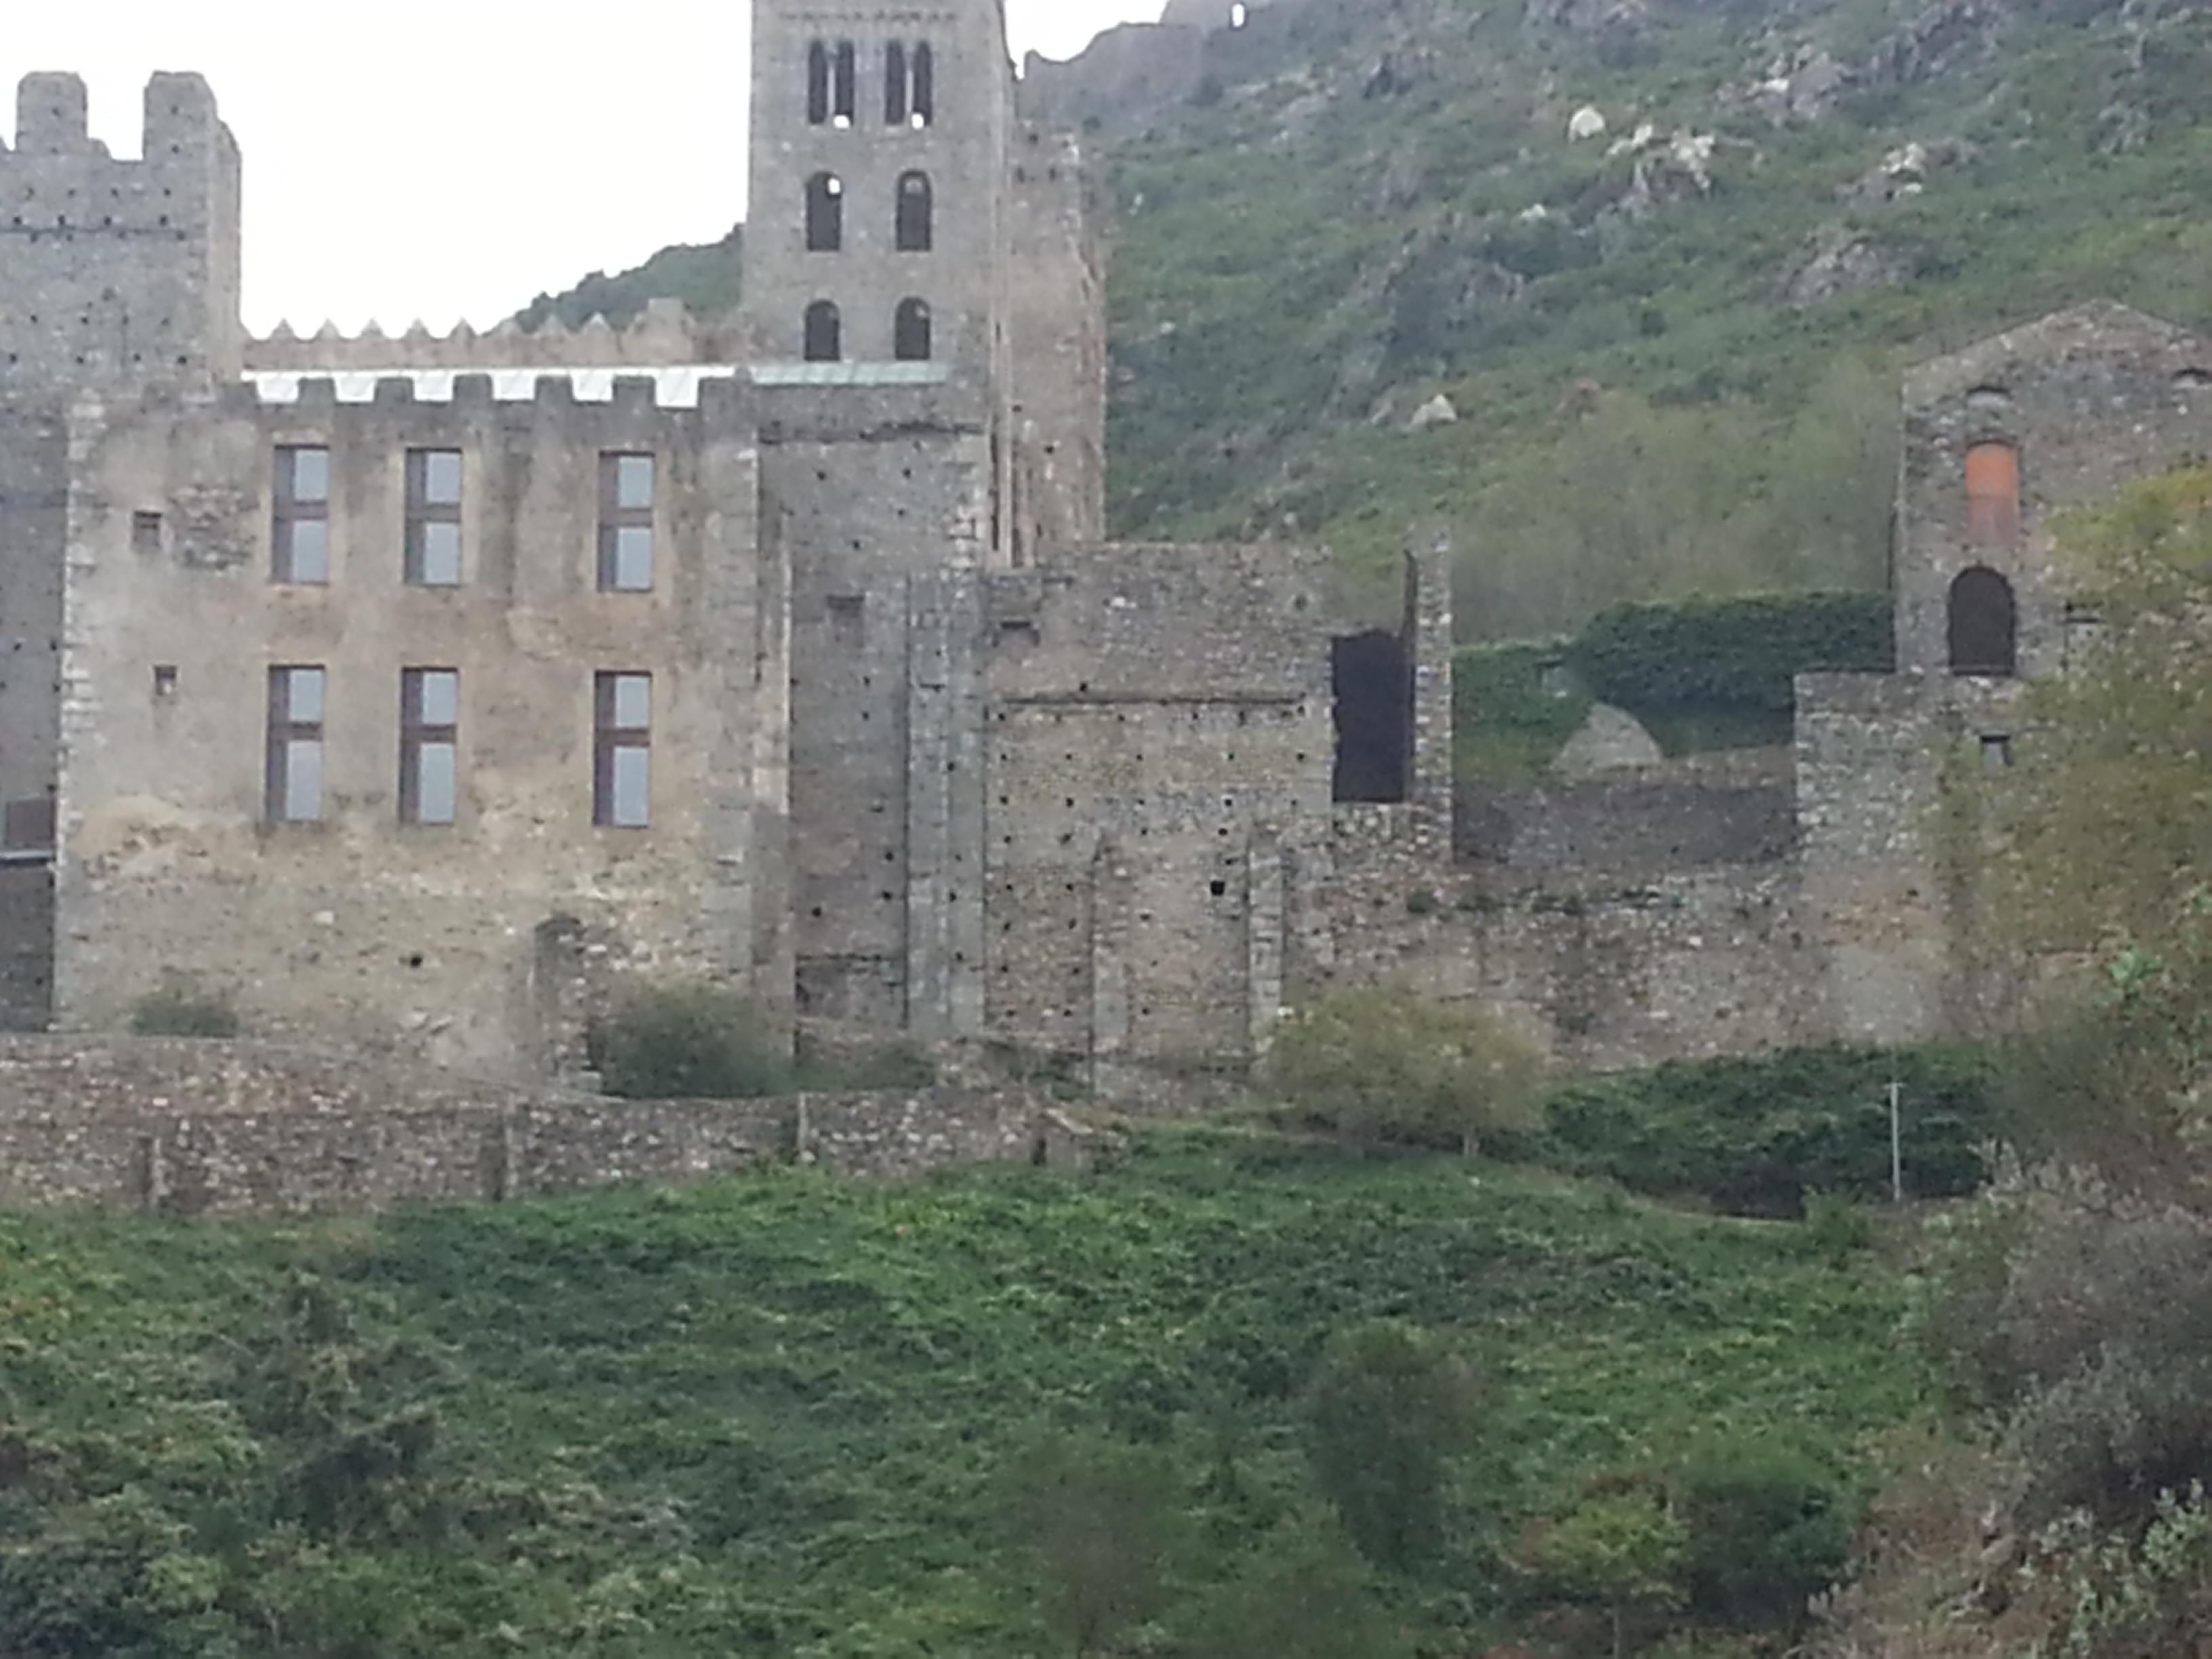 MONASTERE DE SAN PERE DE RODES